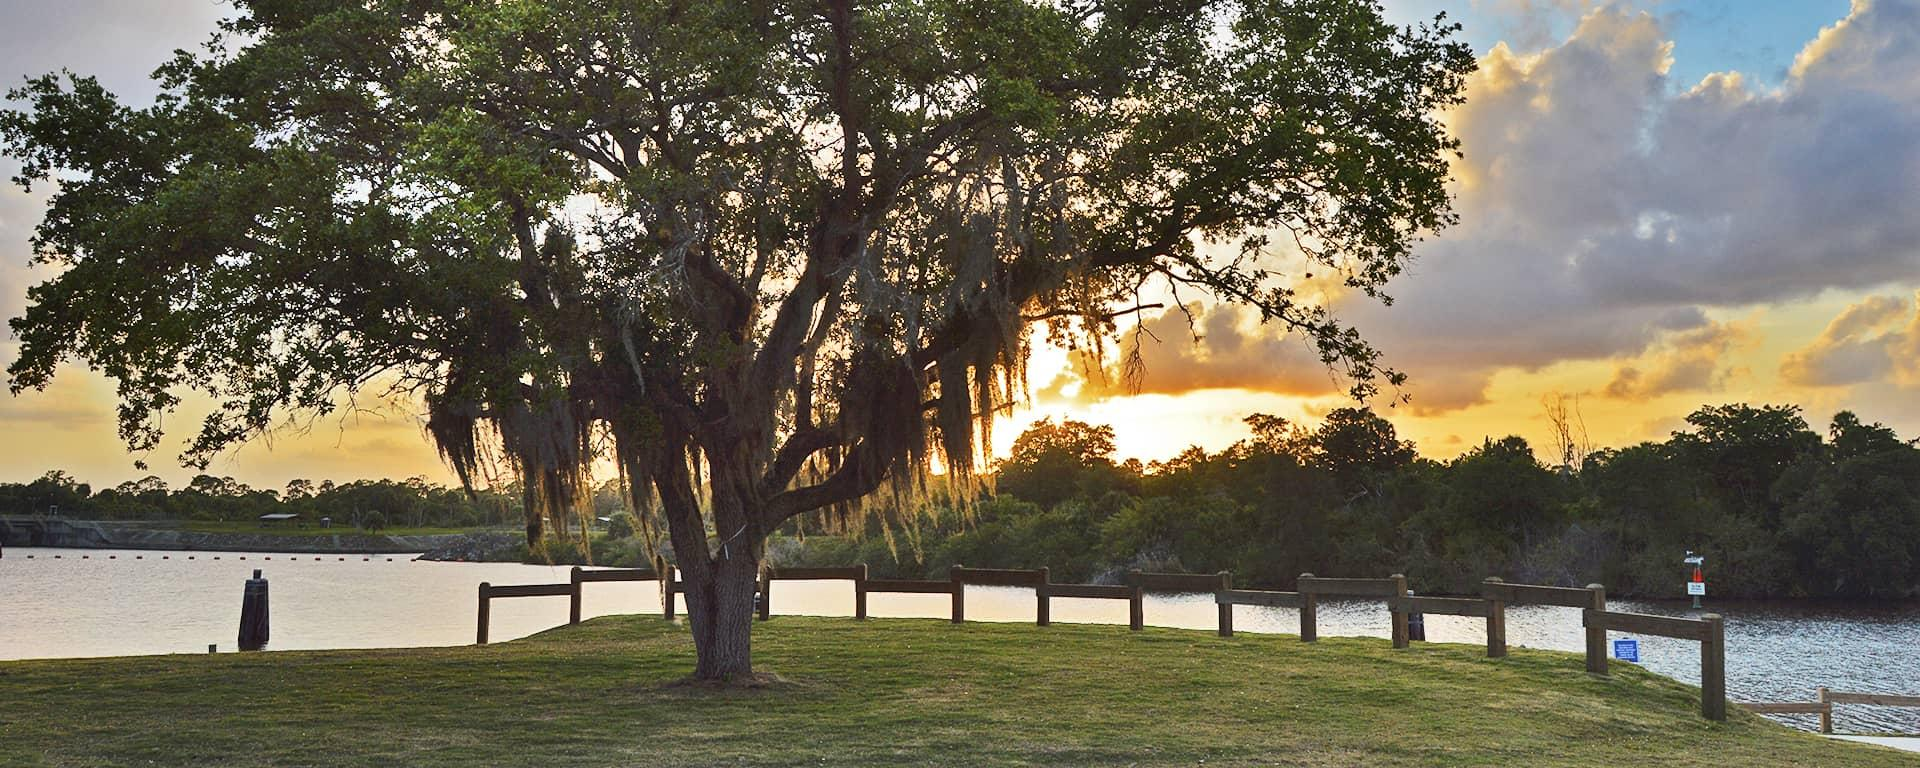 Sunset at Phipps Park